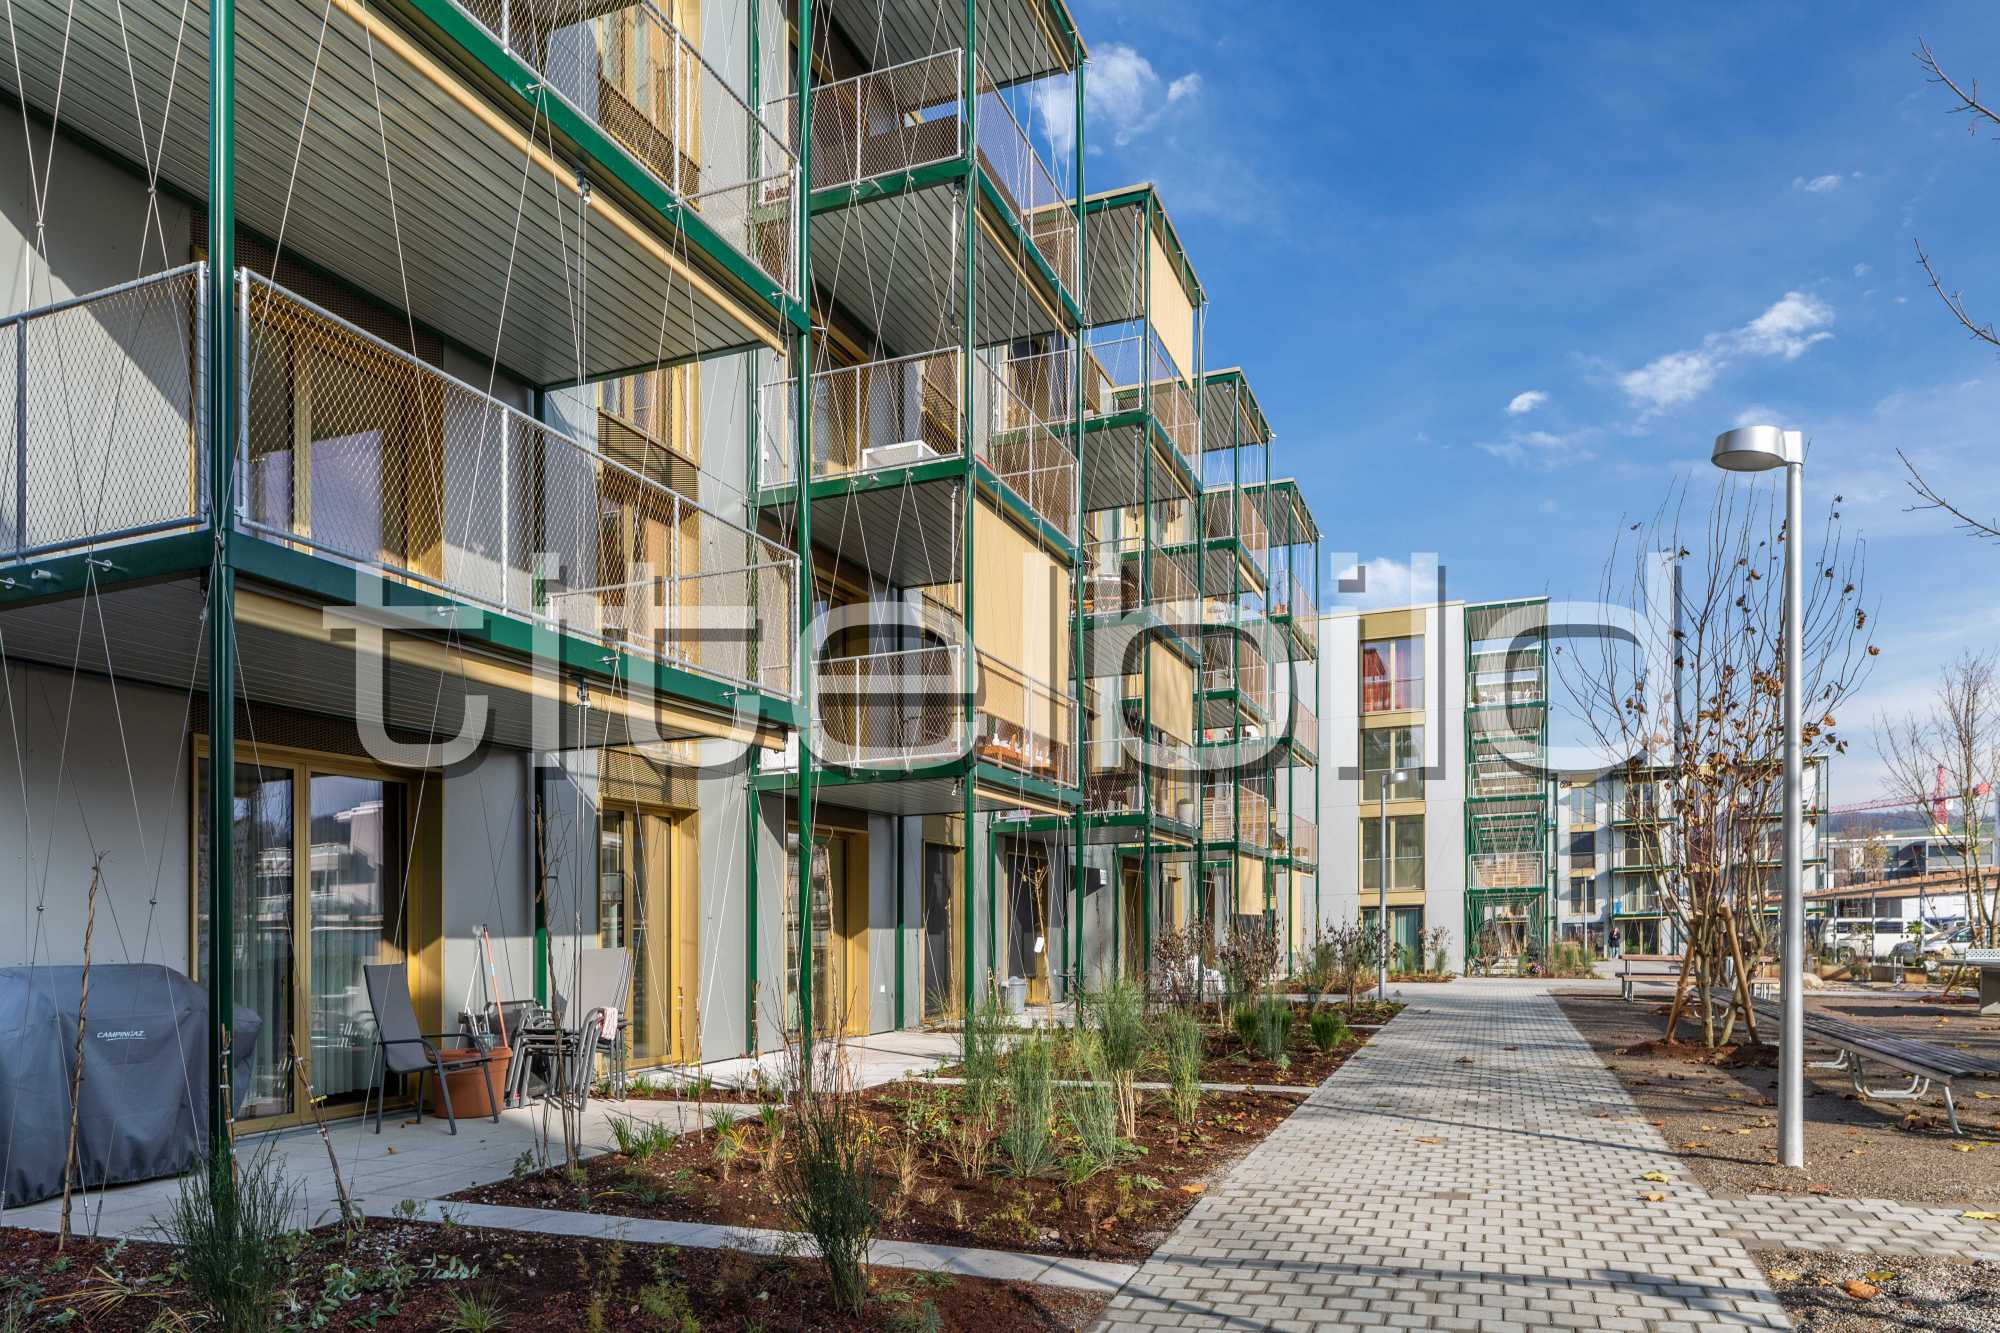 Projektbild-Nr. 5: Quattro Sorelle, Bülach